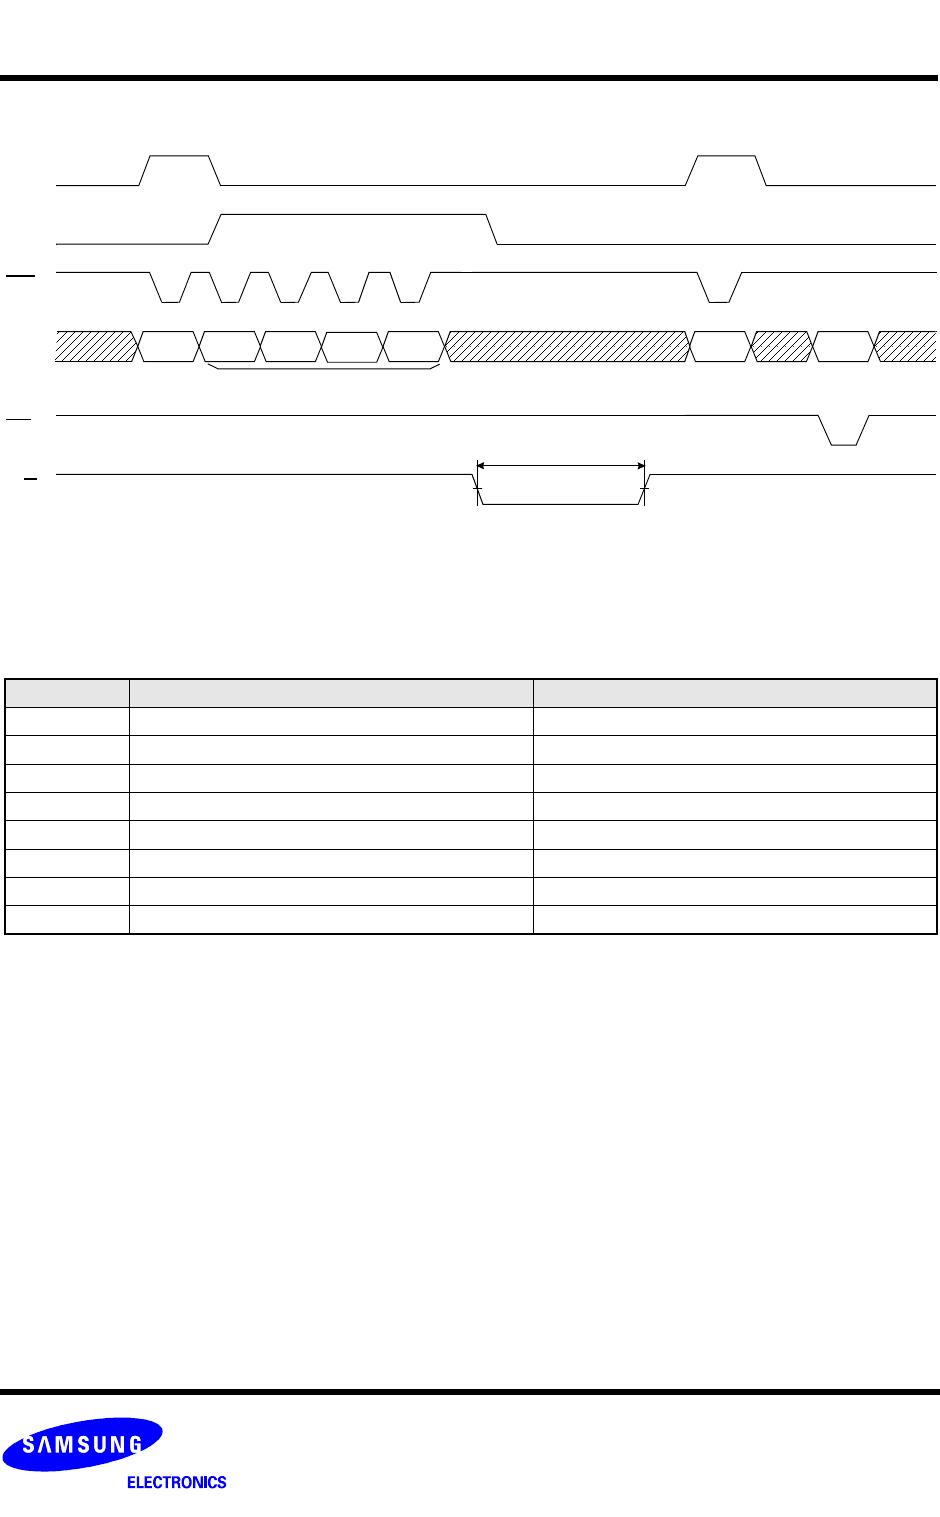 ��f��k9ge�f�x�_k9f1208x0c pdf下载及第32页内容在线浏览